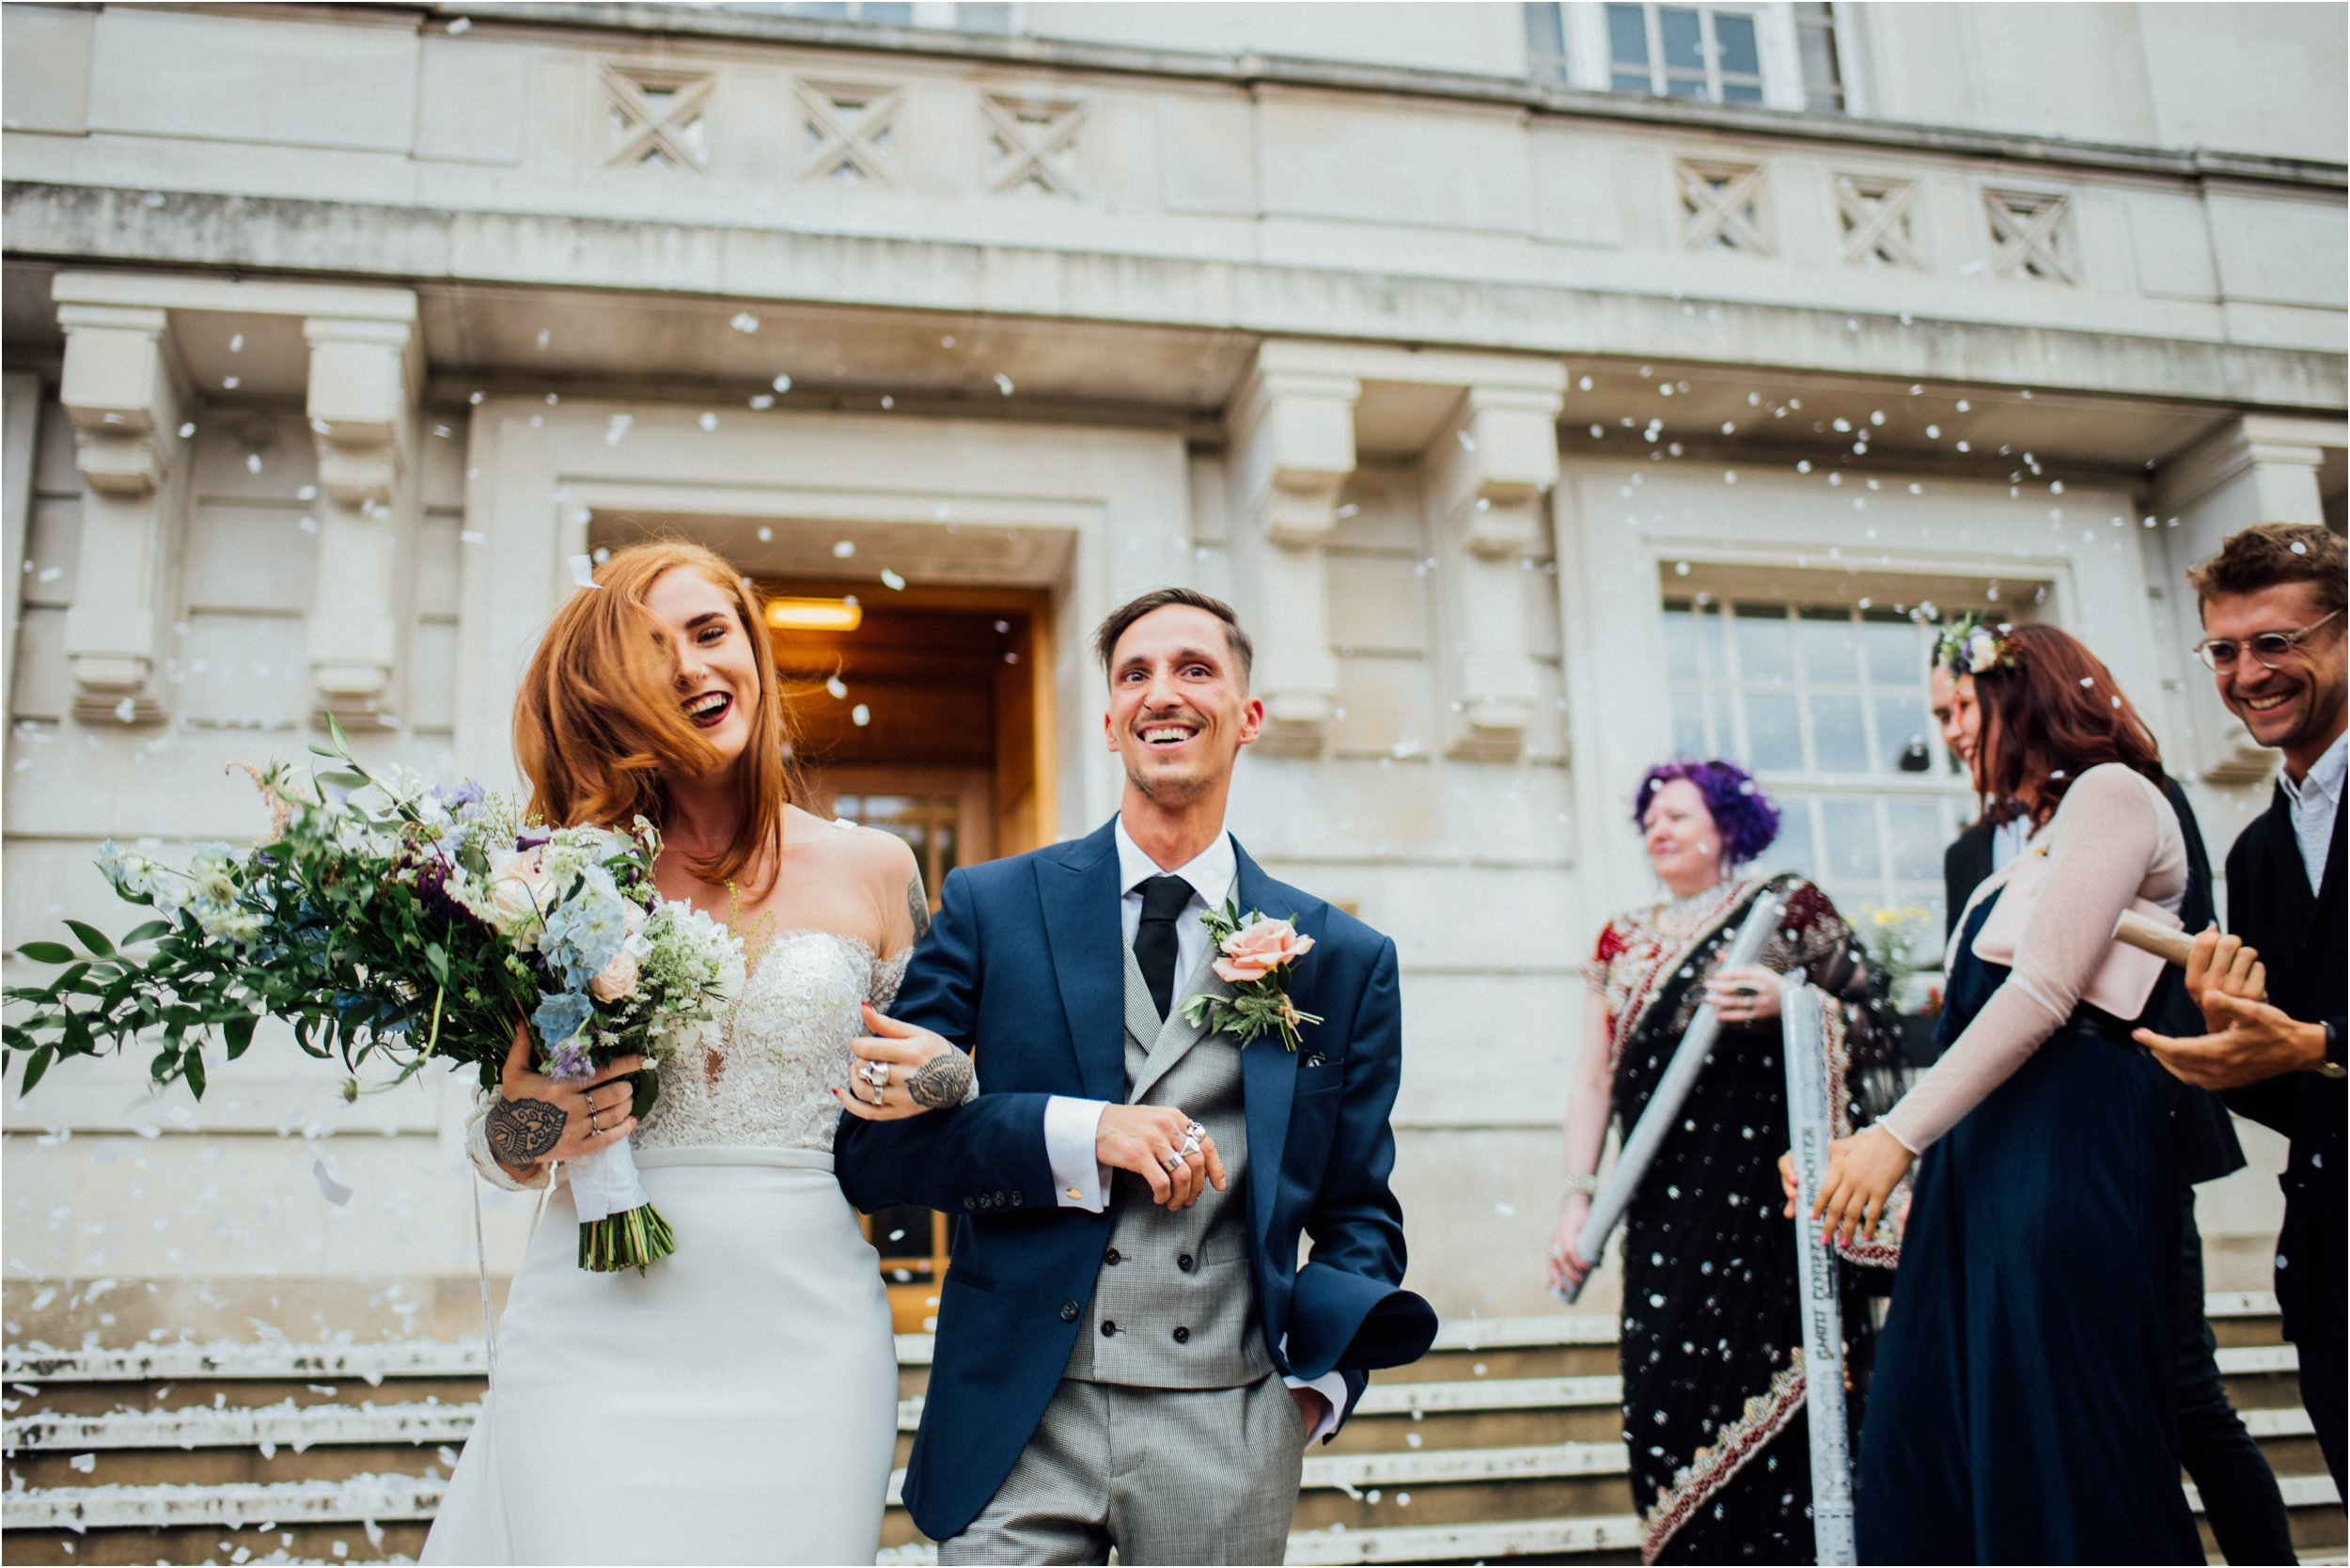 Hackney town hall wedding photography_0074.jpg